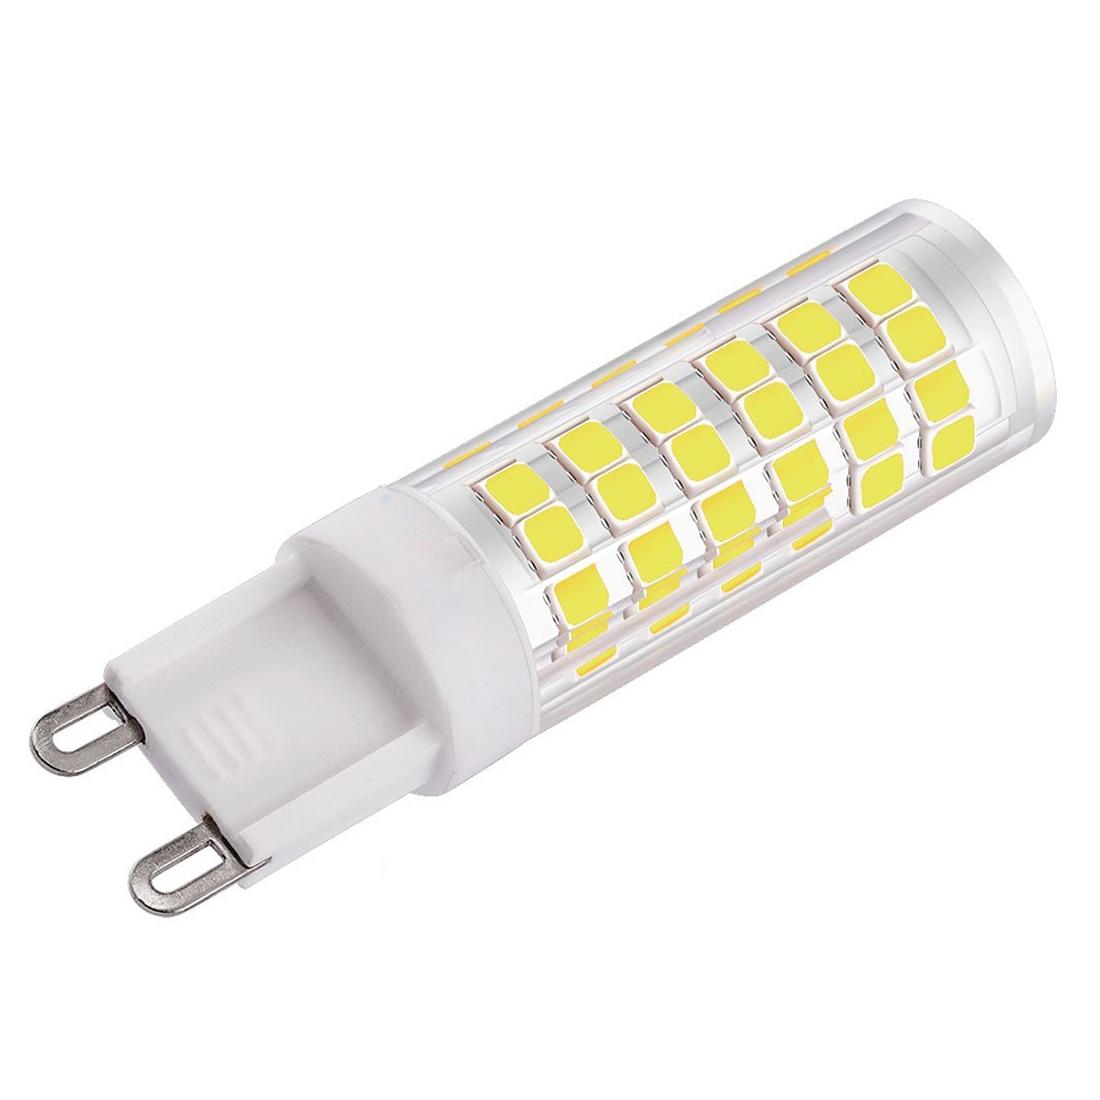 5 pcs G9 LED Bulb - 7W / 550LM, 60 Watt Halogen Bulbs Equivalent 6000K 360 Degree  Beam Angle [Energy Class A+] daylight white 15w dimmable led br40 light bulb e27 e26 screw base wide beam angle 120 degrees 100w halogen bulb equivalent